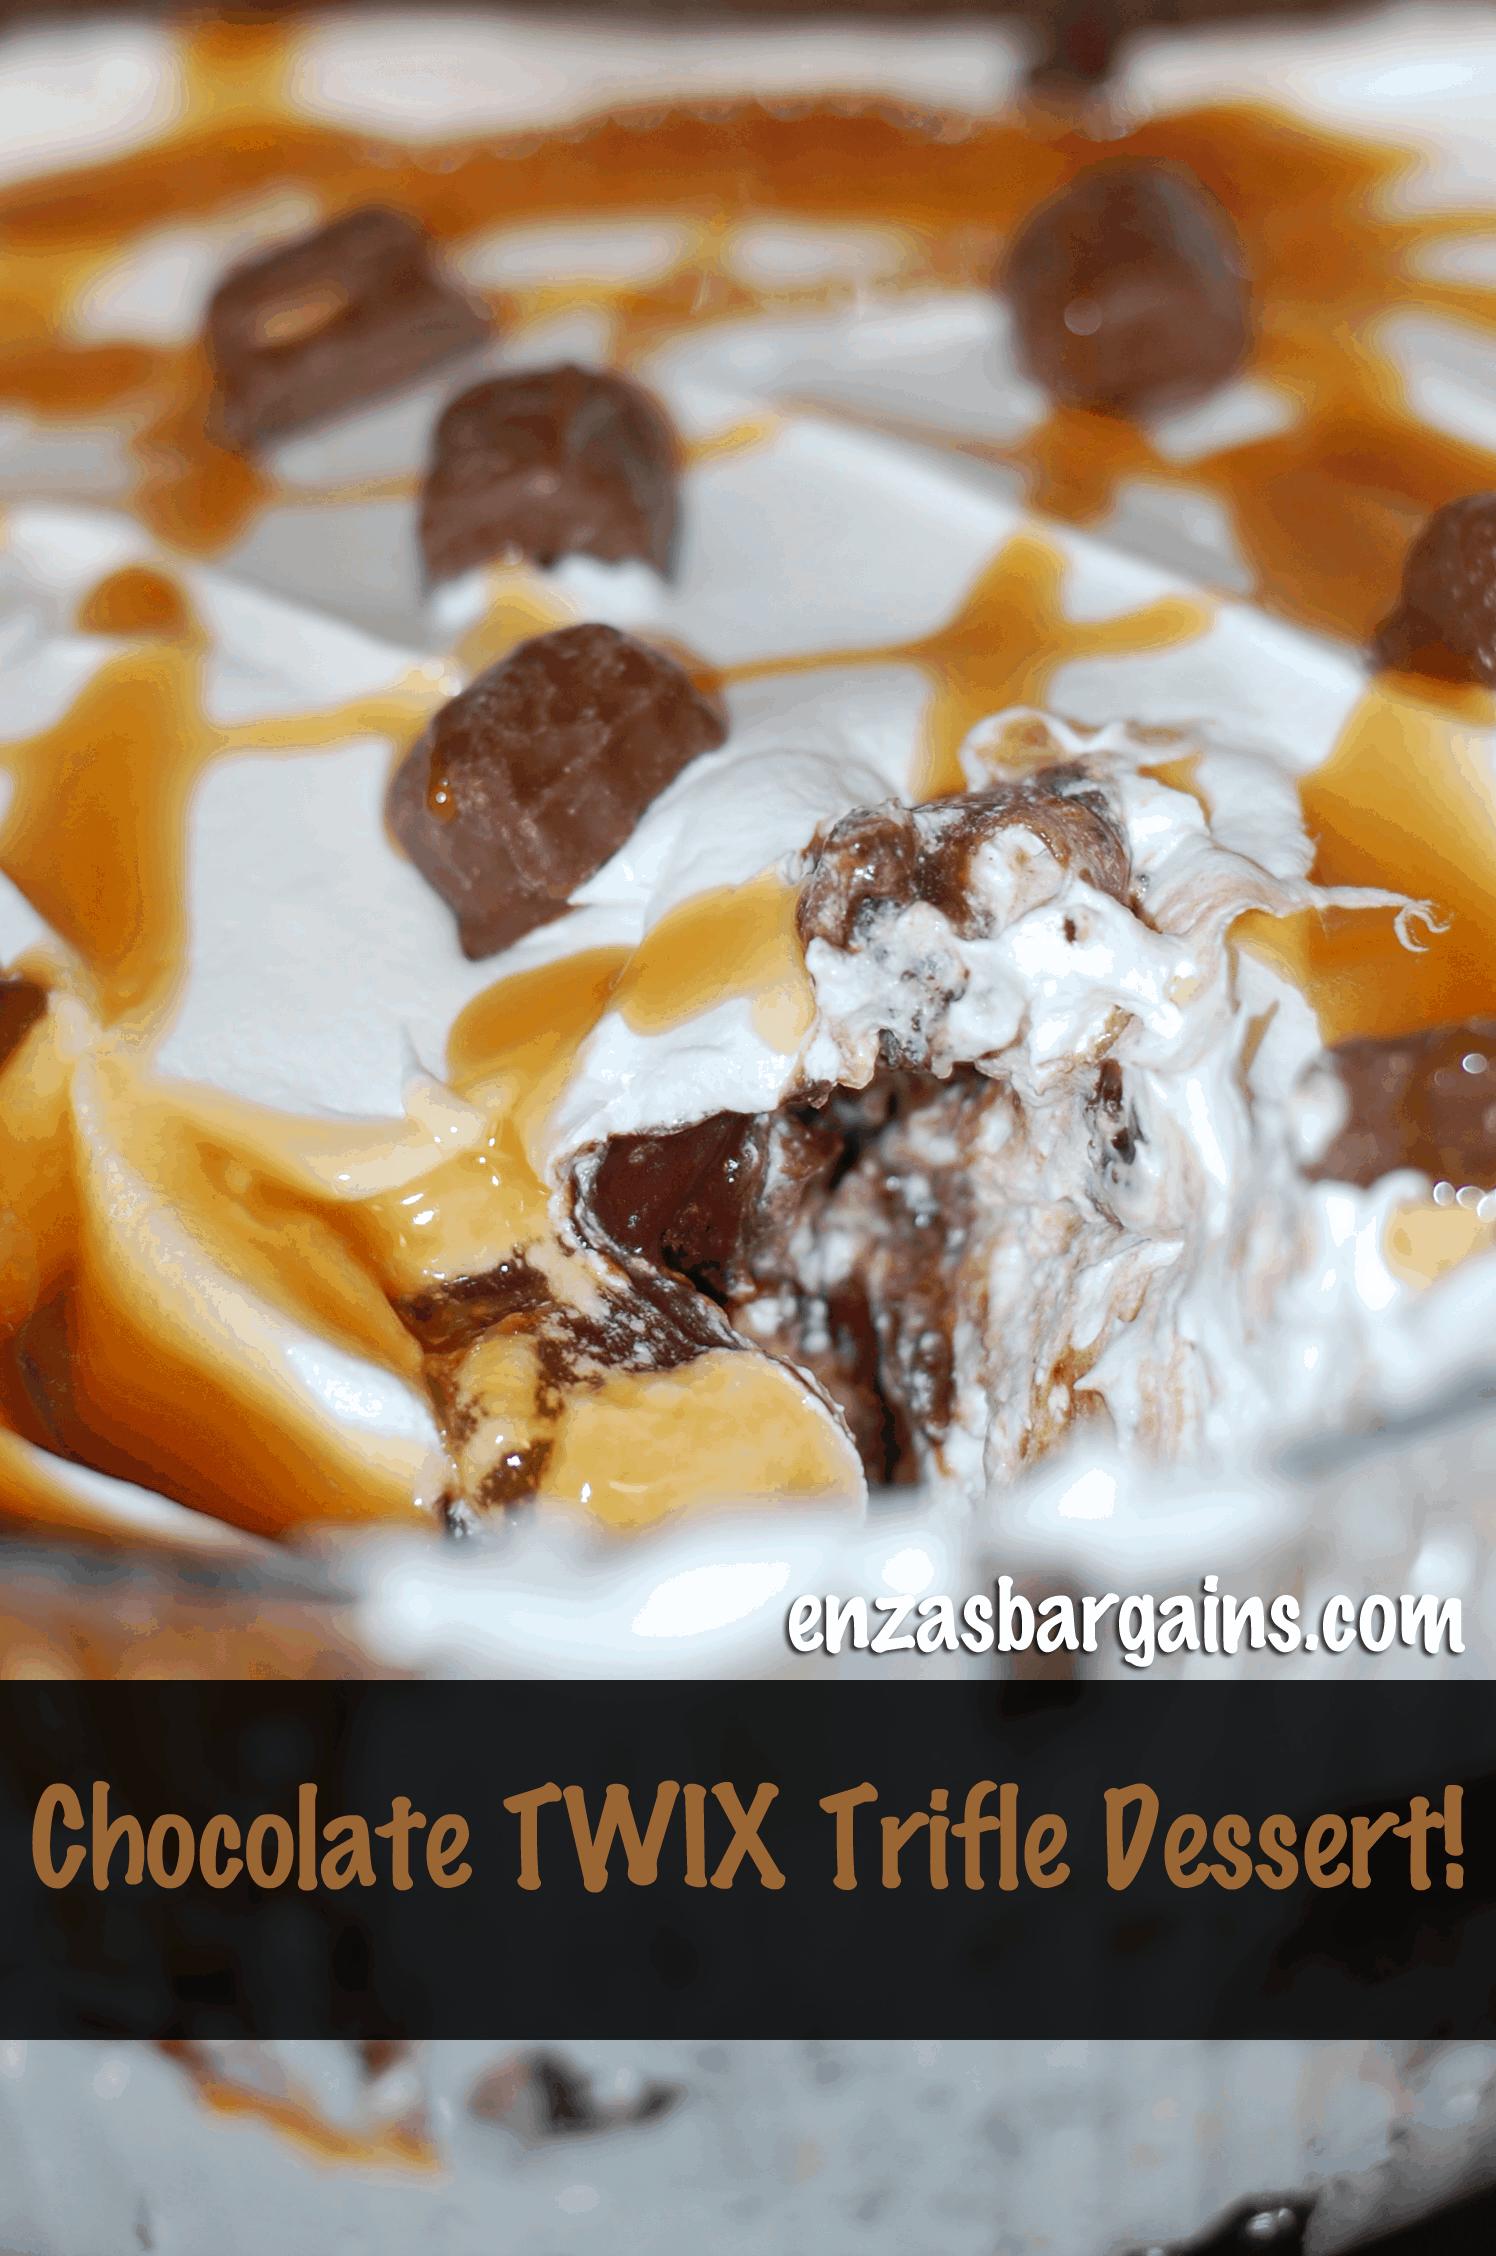 Twix Dessert: Chocolate Trifle Dessert Made With TWIX Bites!